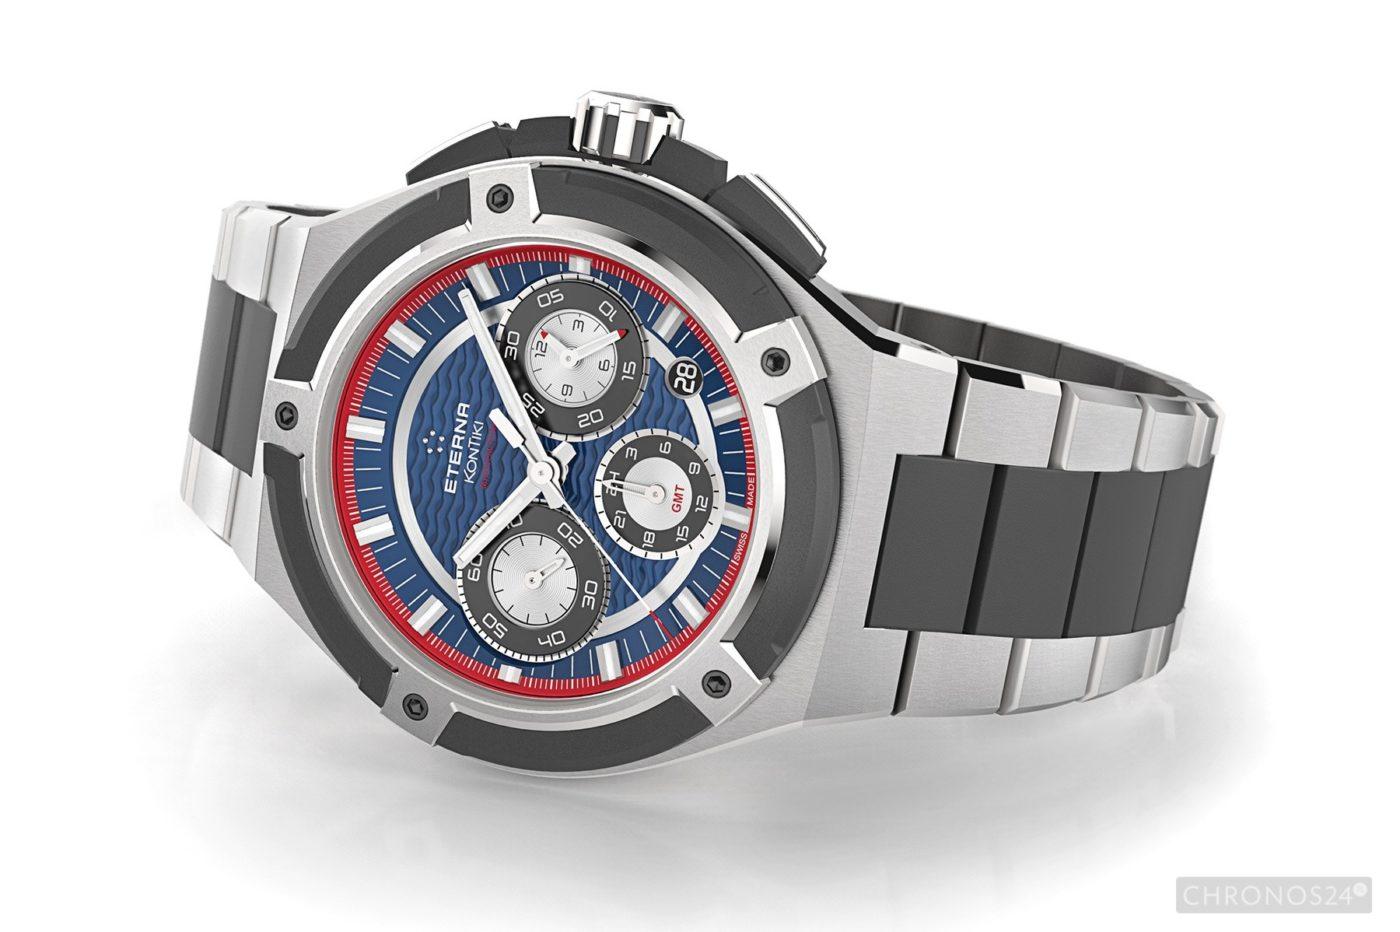 Basel 2015: Eterna Royal KonTiki Chronograph GMT